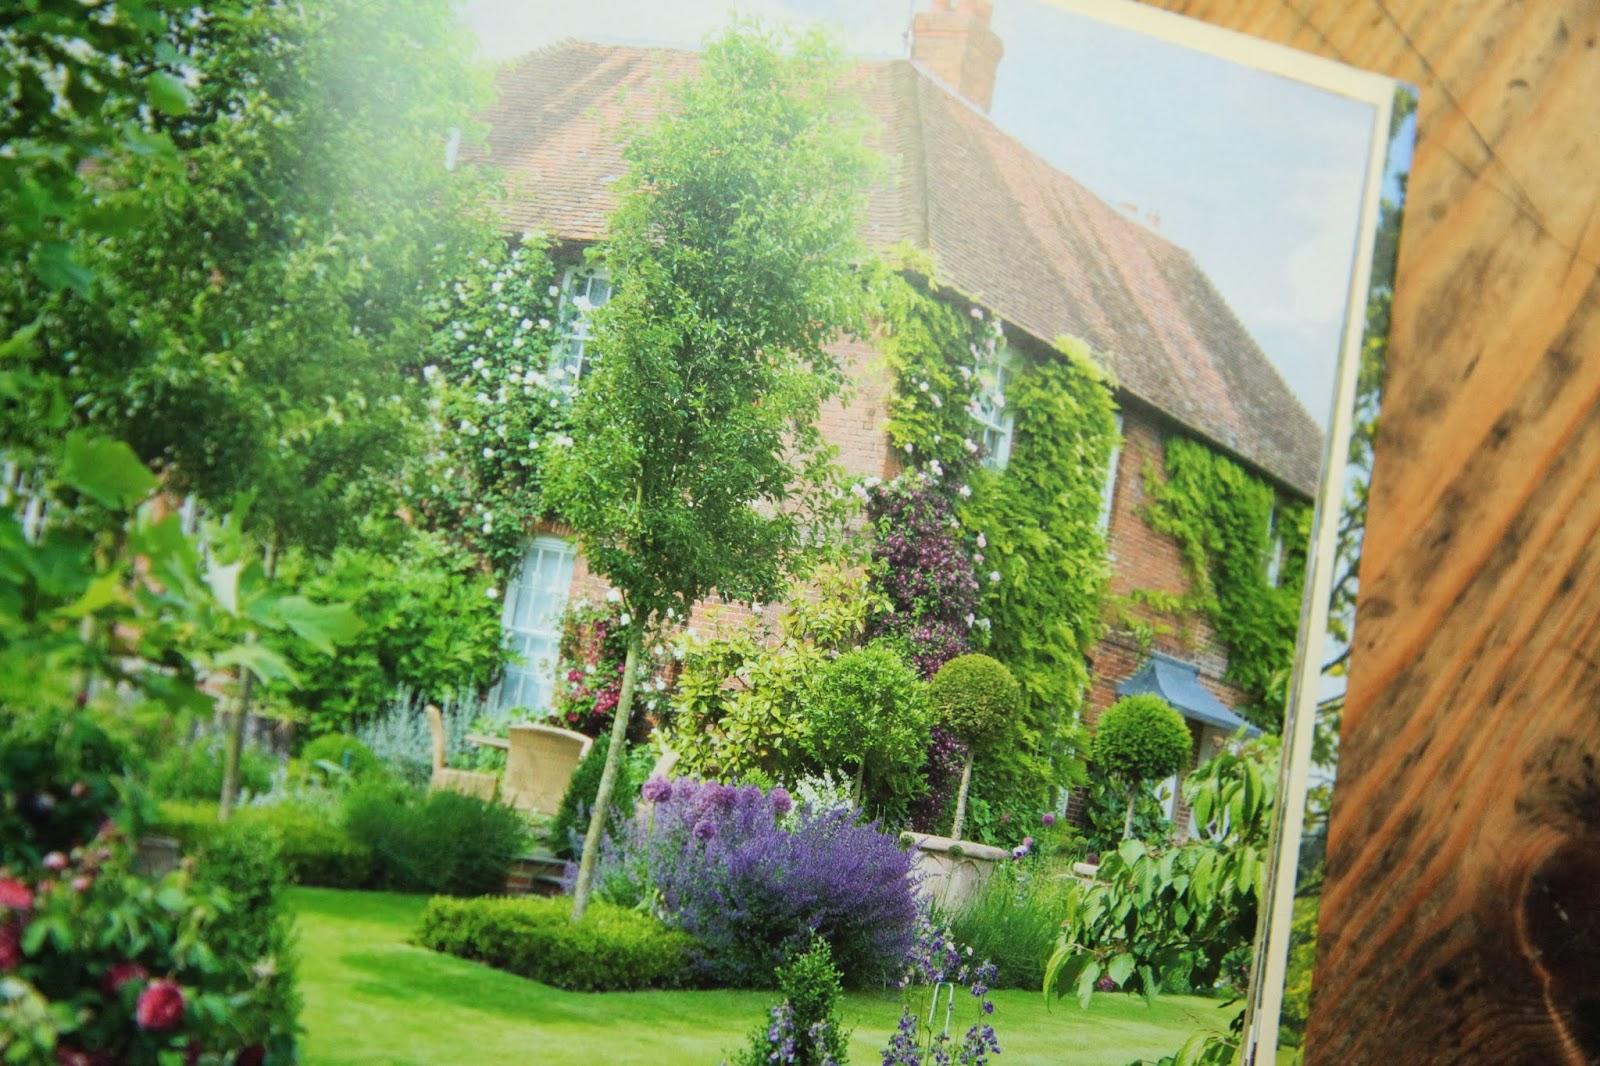 Secret Garden: Modern Country Style: My Secret Garden By Alan Titchmarsh